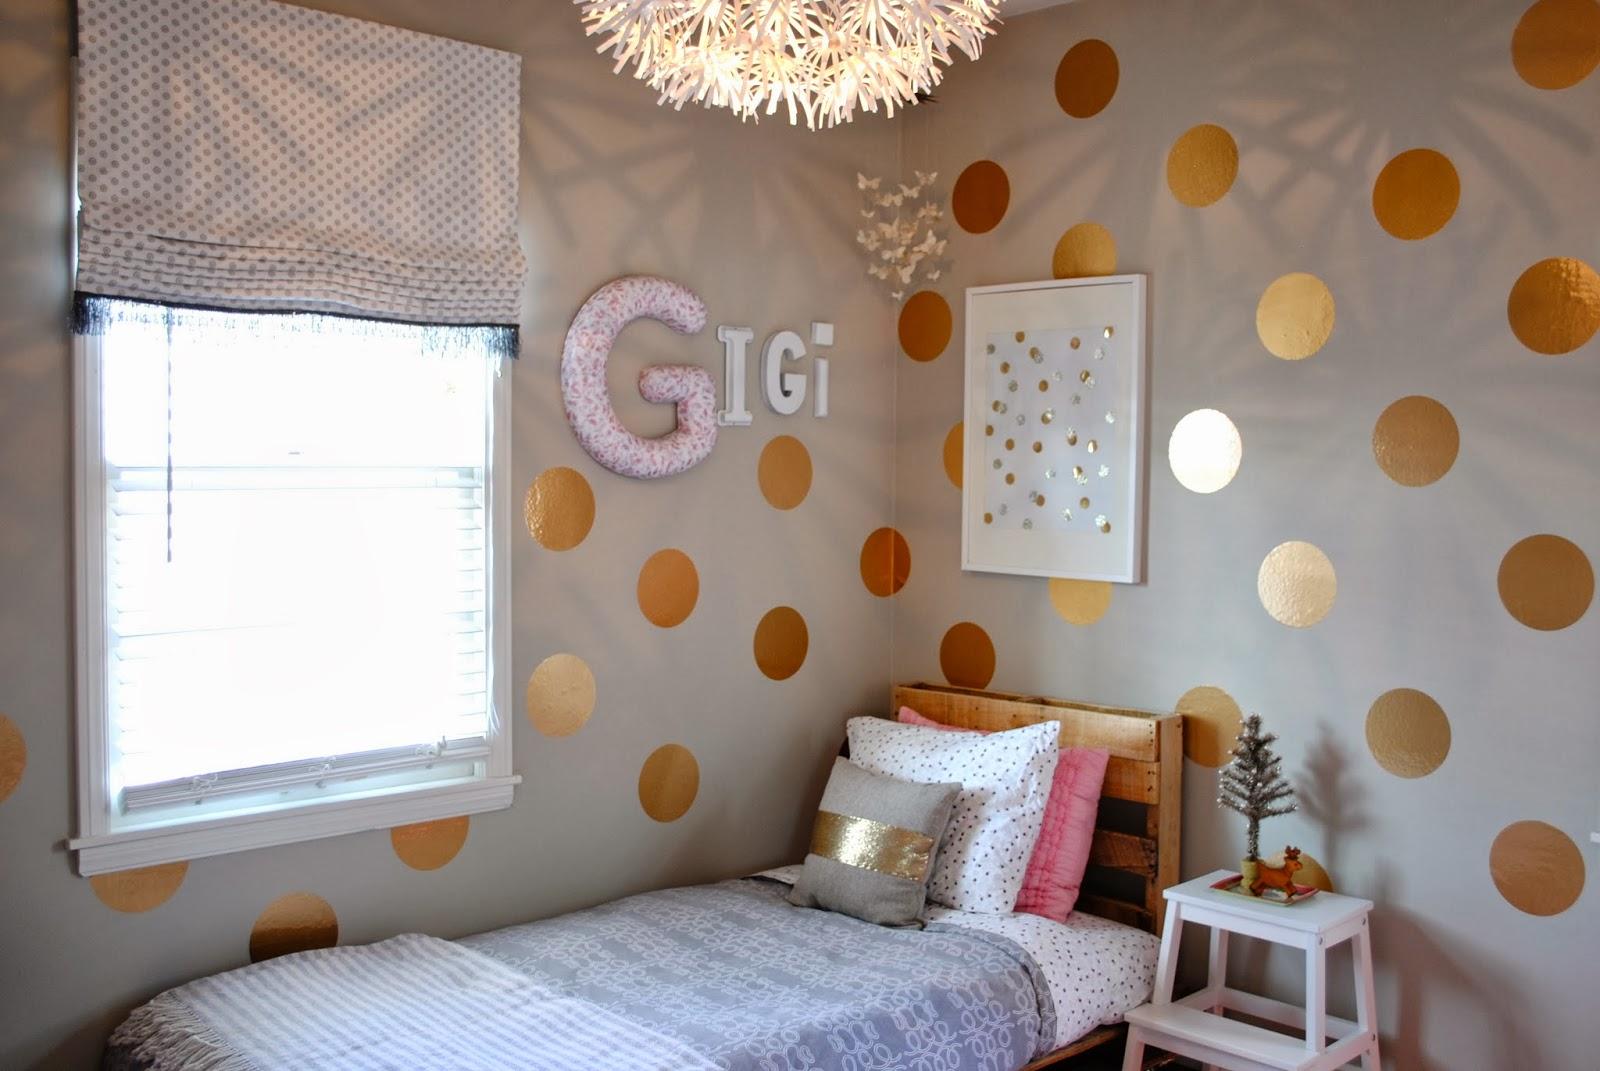 Gigi's Polka Dot Room